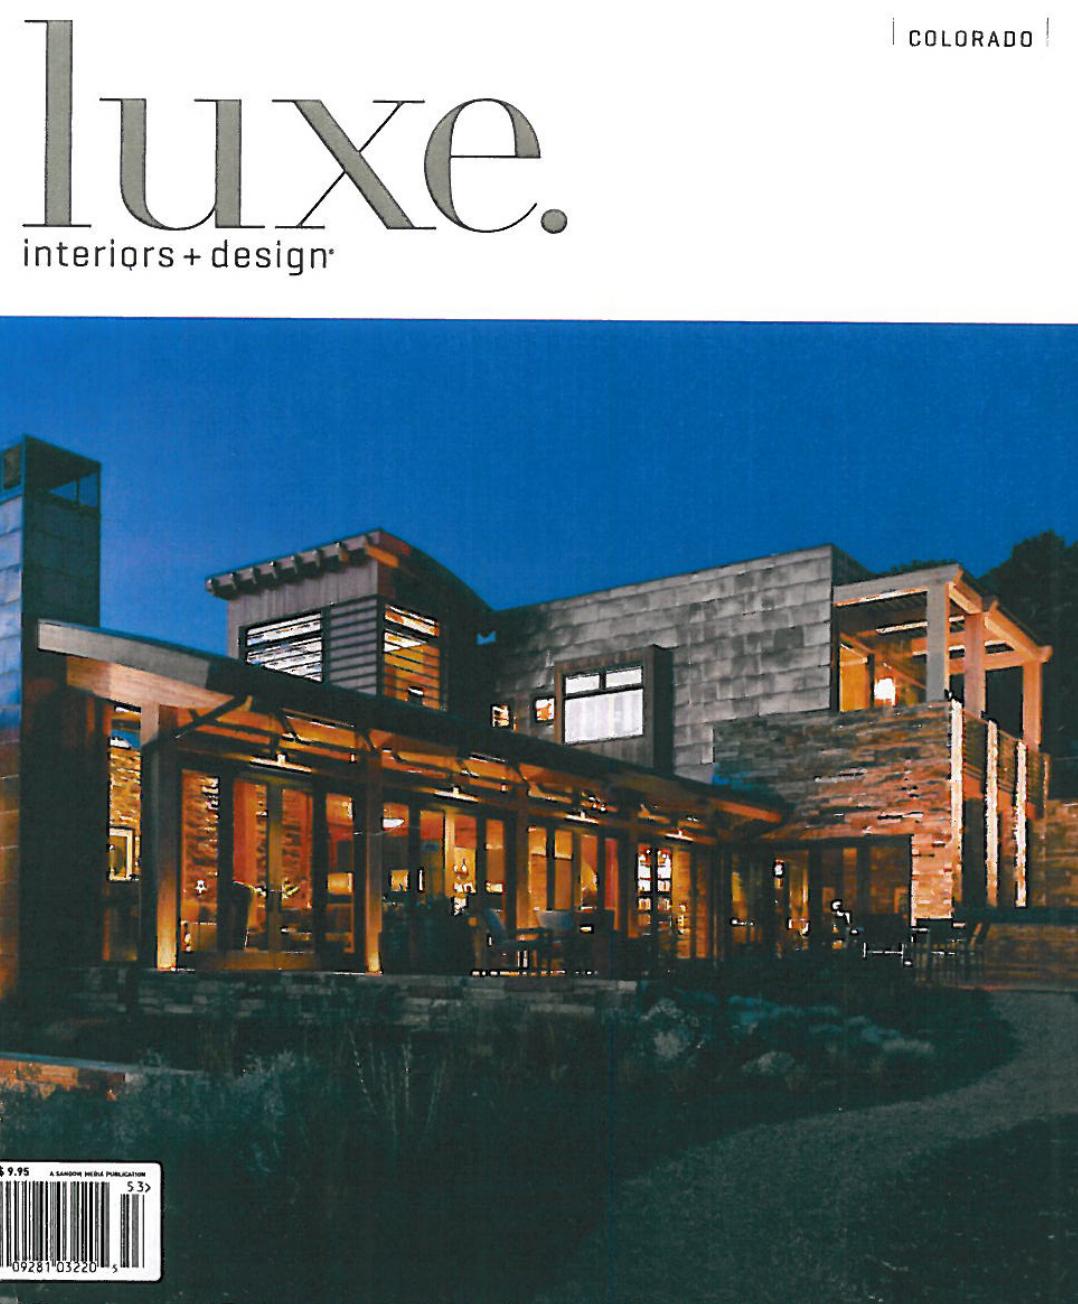 Summer 2010, LUXE magazine